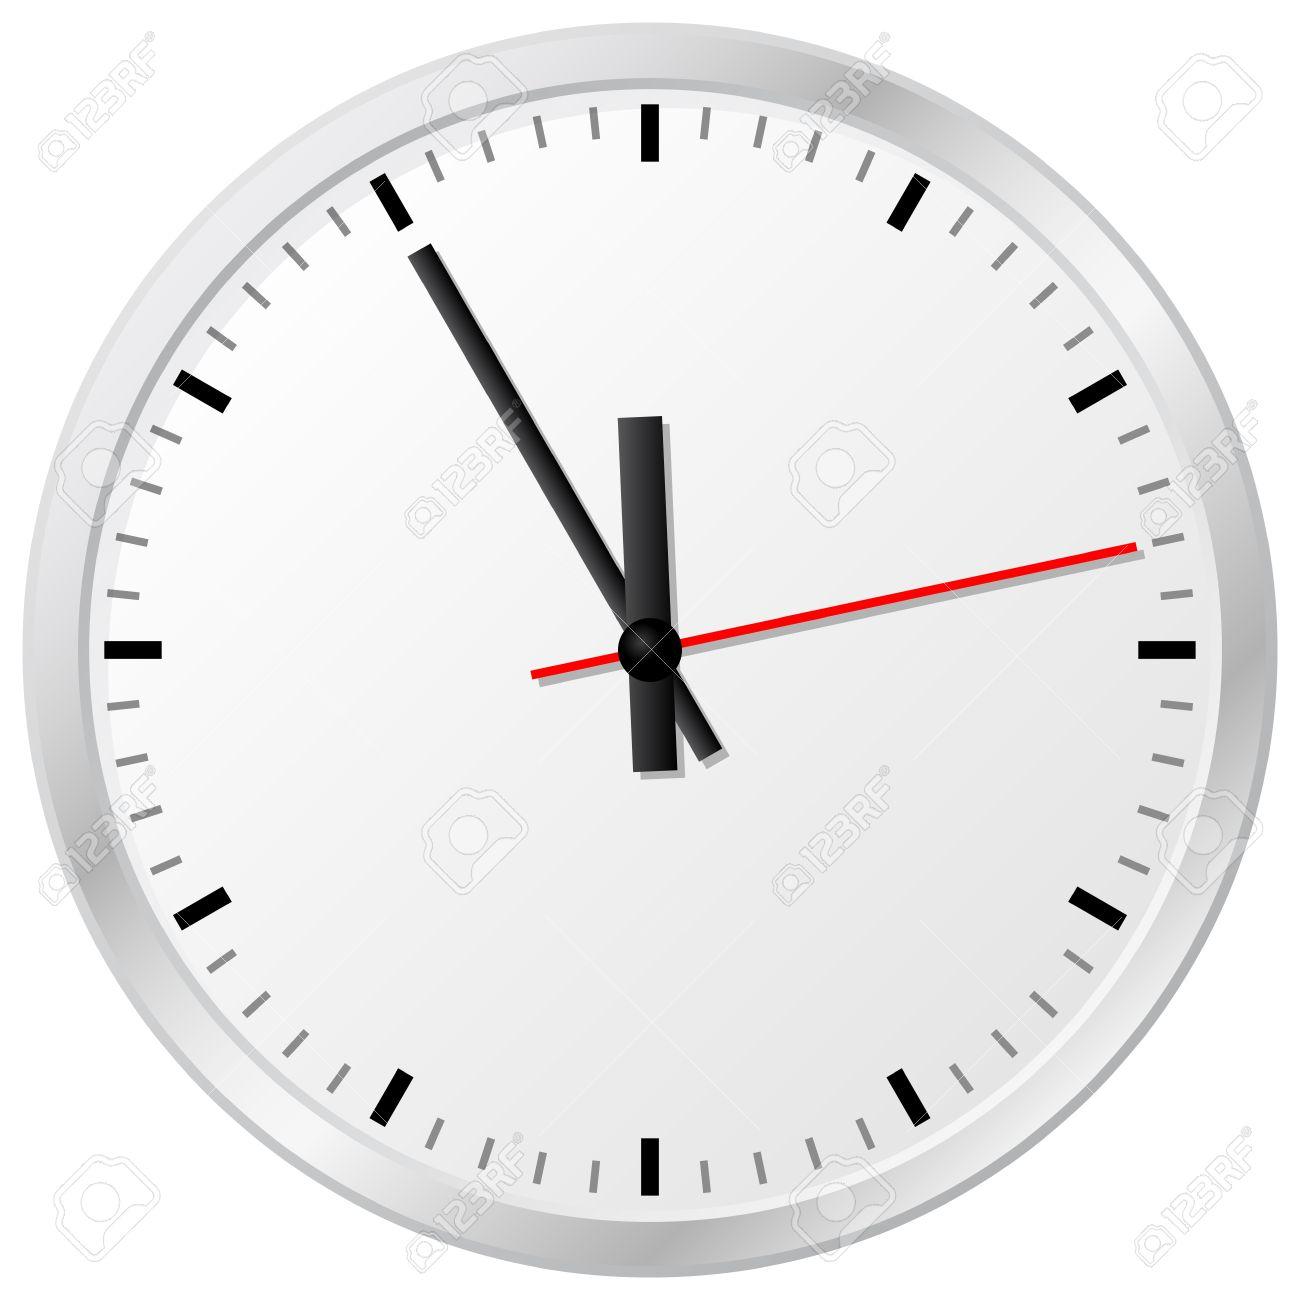 illustration of a plain wall clock in the eleventh hour royalty free rh 123rf com Cute Clock Clip Art Digital Clock Face